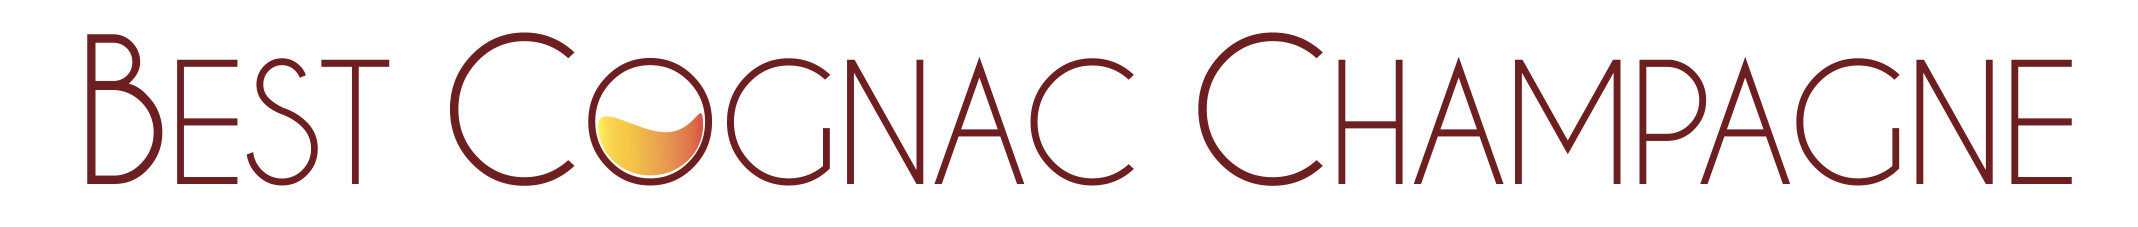 logo best cognac champagne